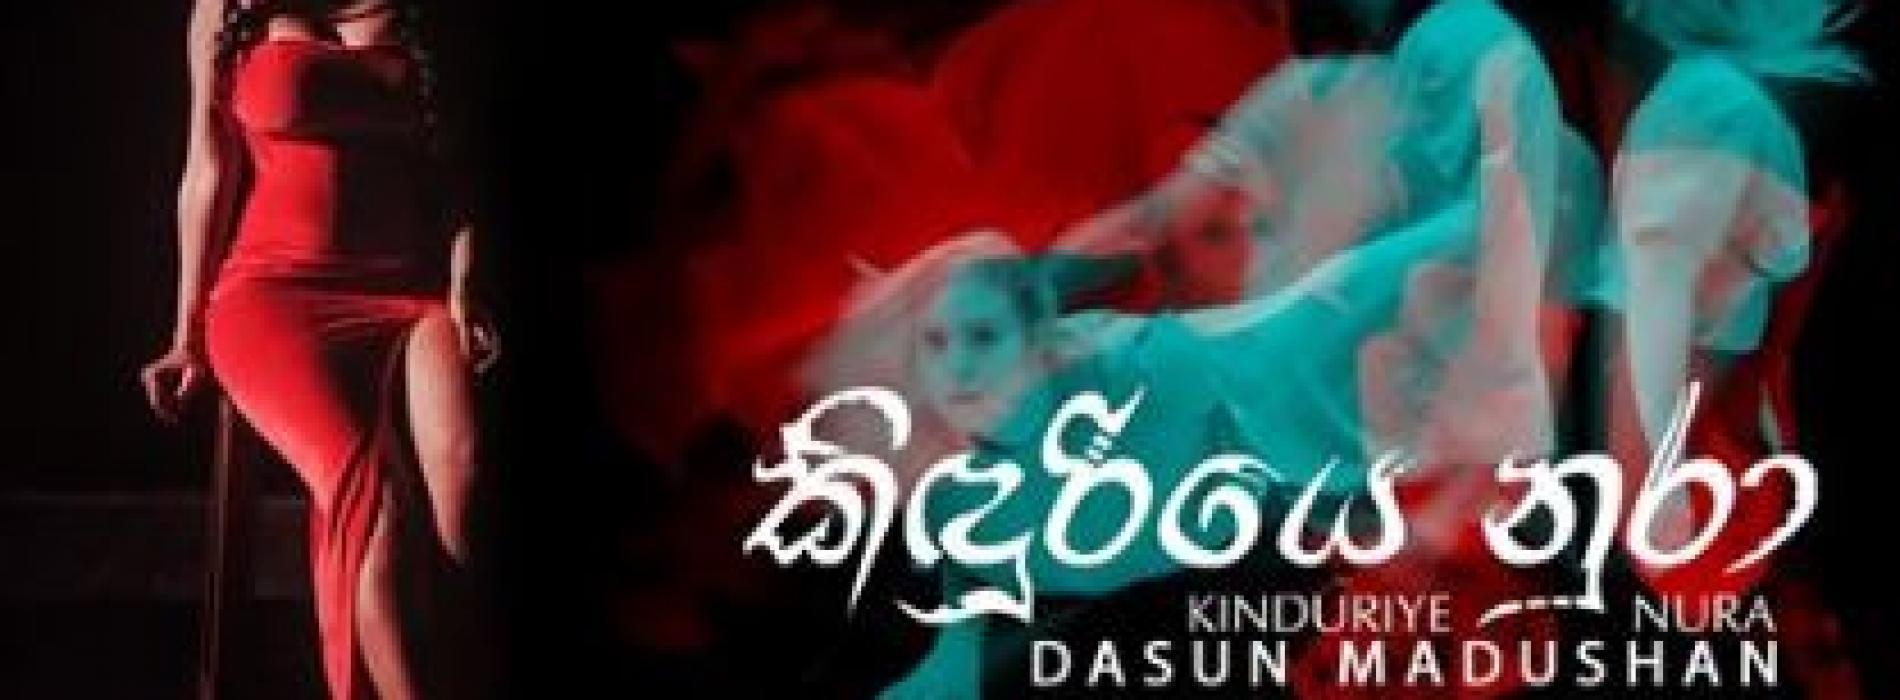 New Music : Dasun Madushan – Kinduriye Nura (කිඳුරියෙ නුරා) / Official Music Video